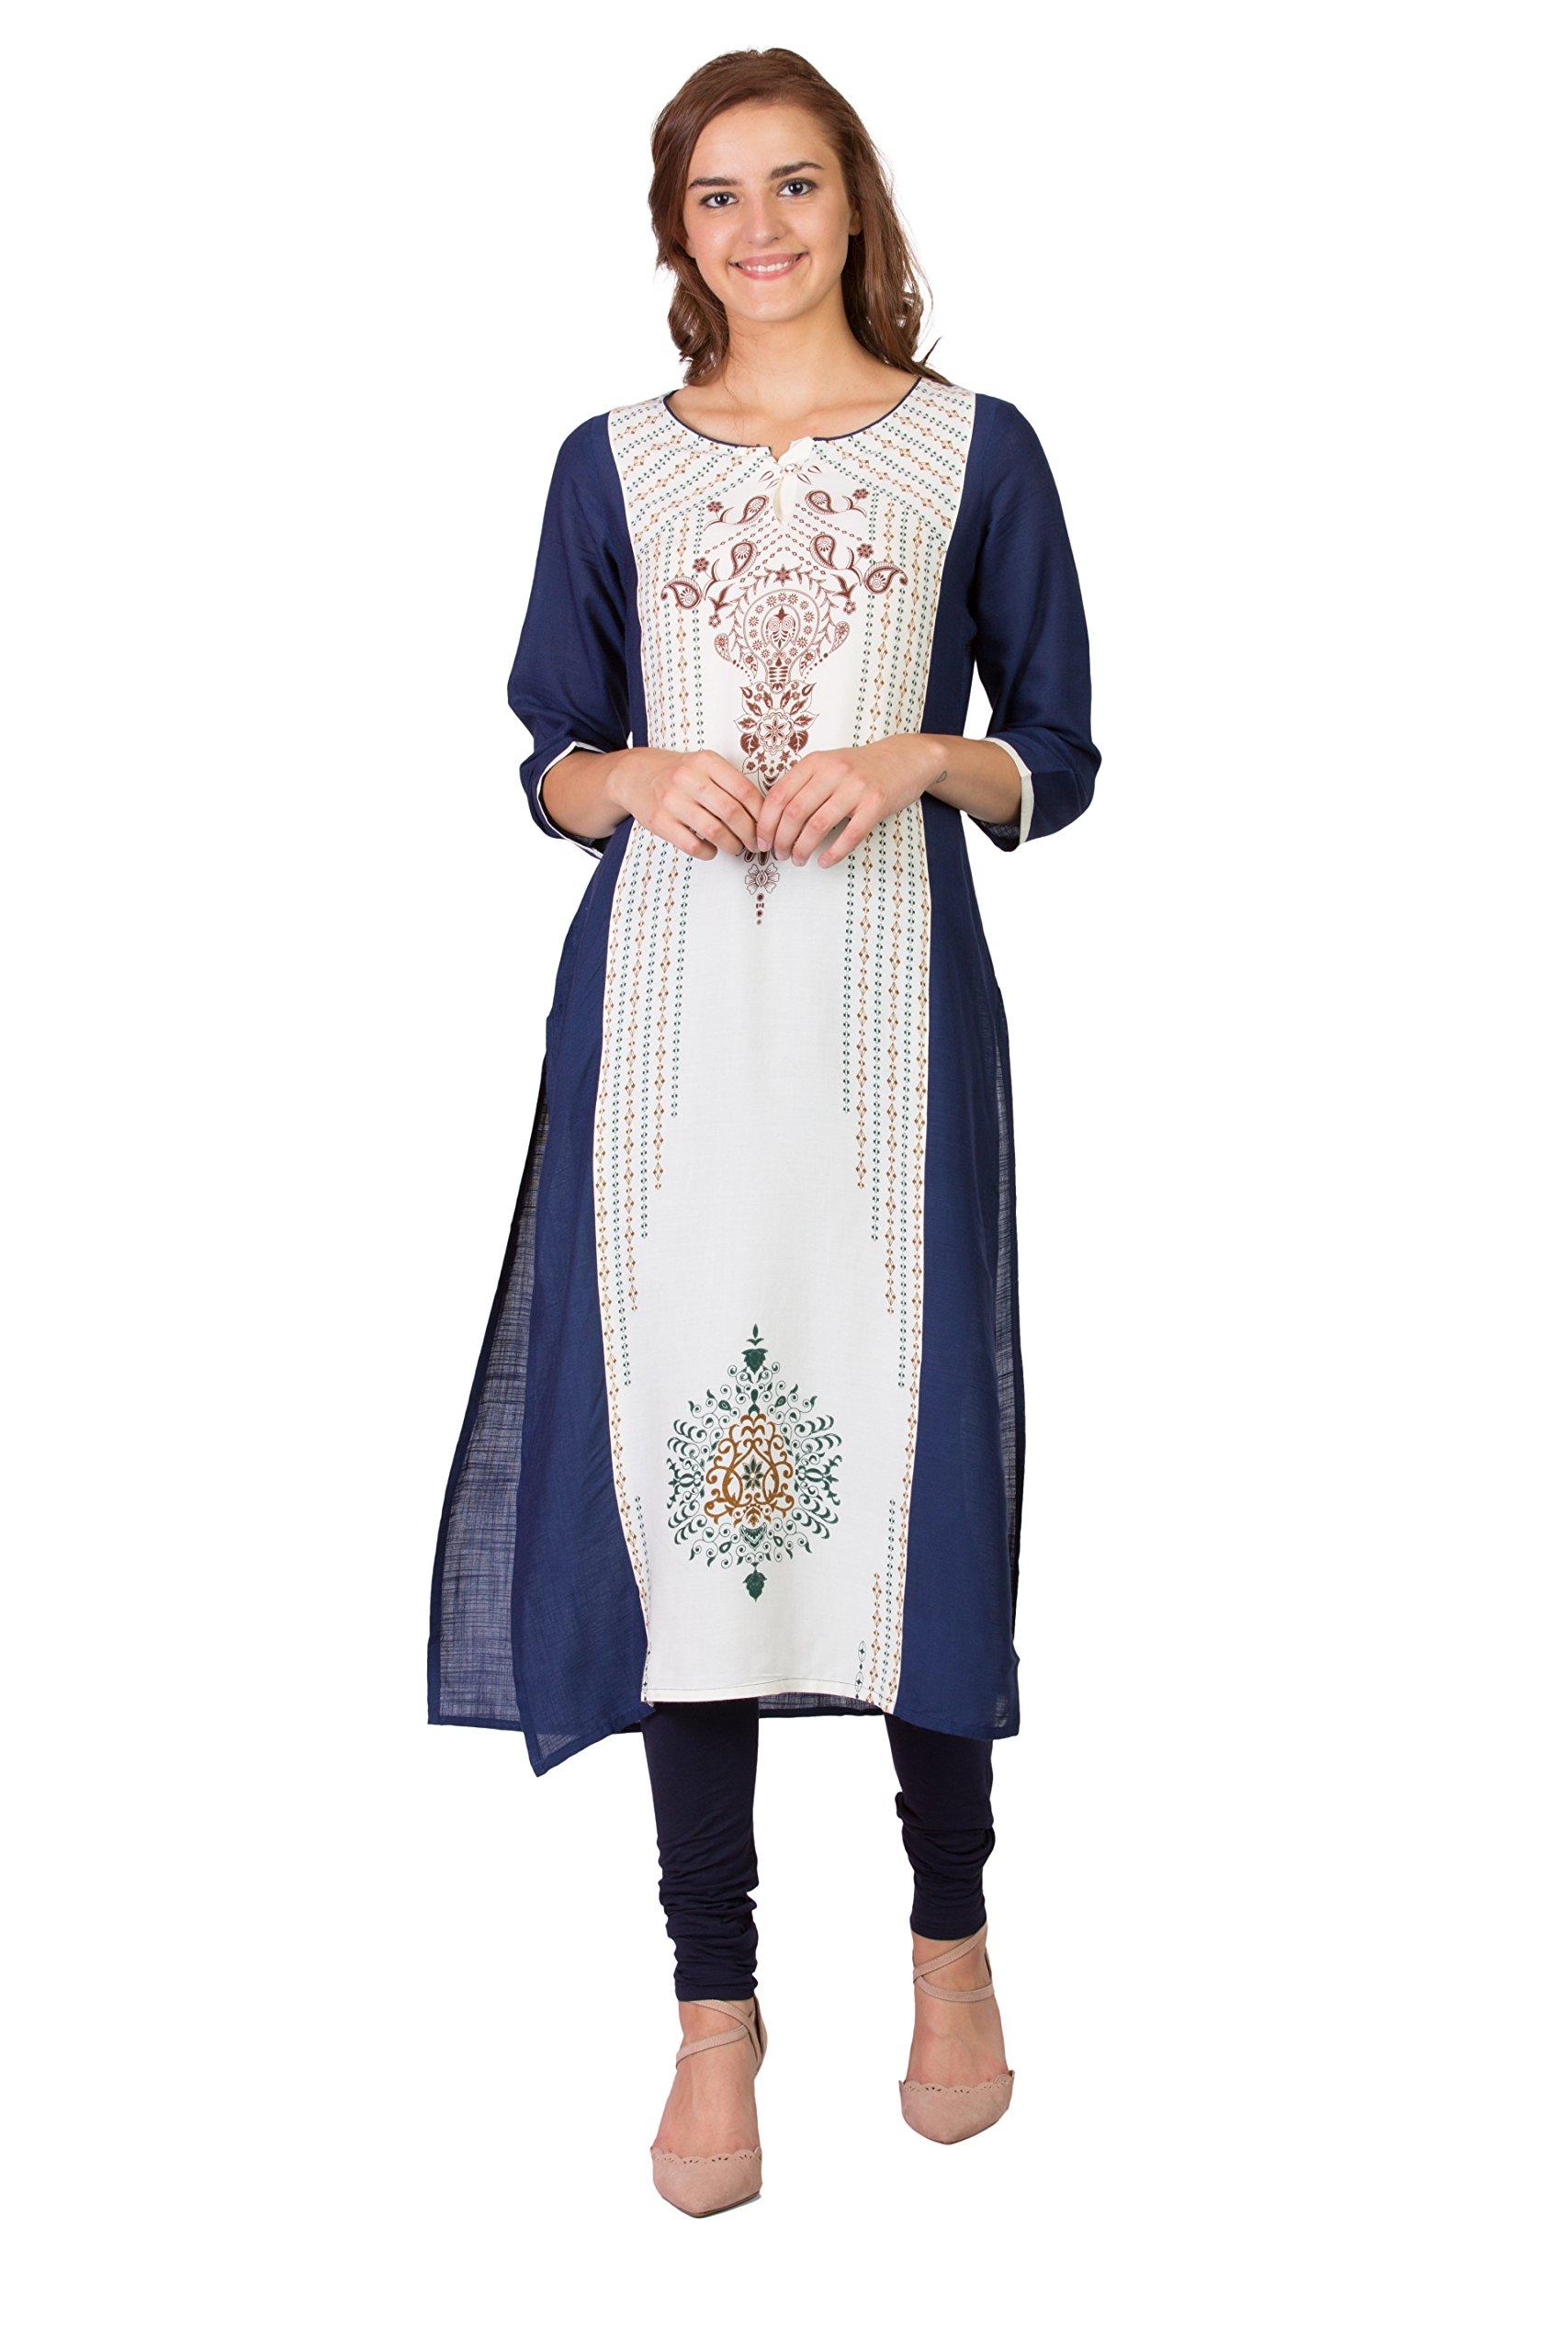 SABHYATA Women Kurta Designer Ethnic Long Dress Casual Tunic Kurti for Women Ladies Partywear Material 100% Pure Cotton Neck Type Round Neck X-Large Off-White/Blue